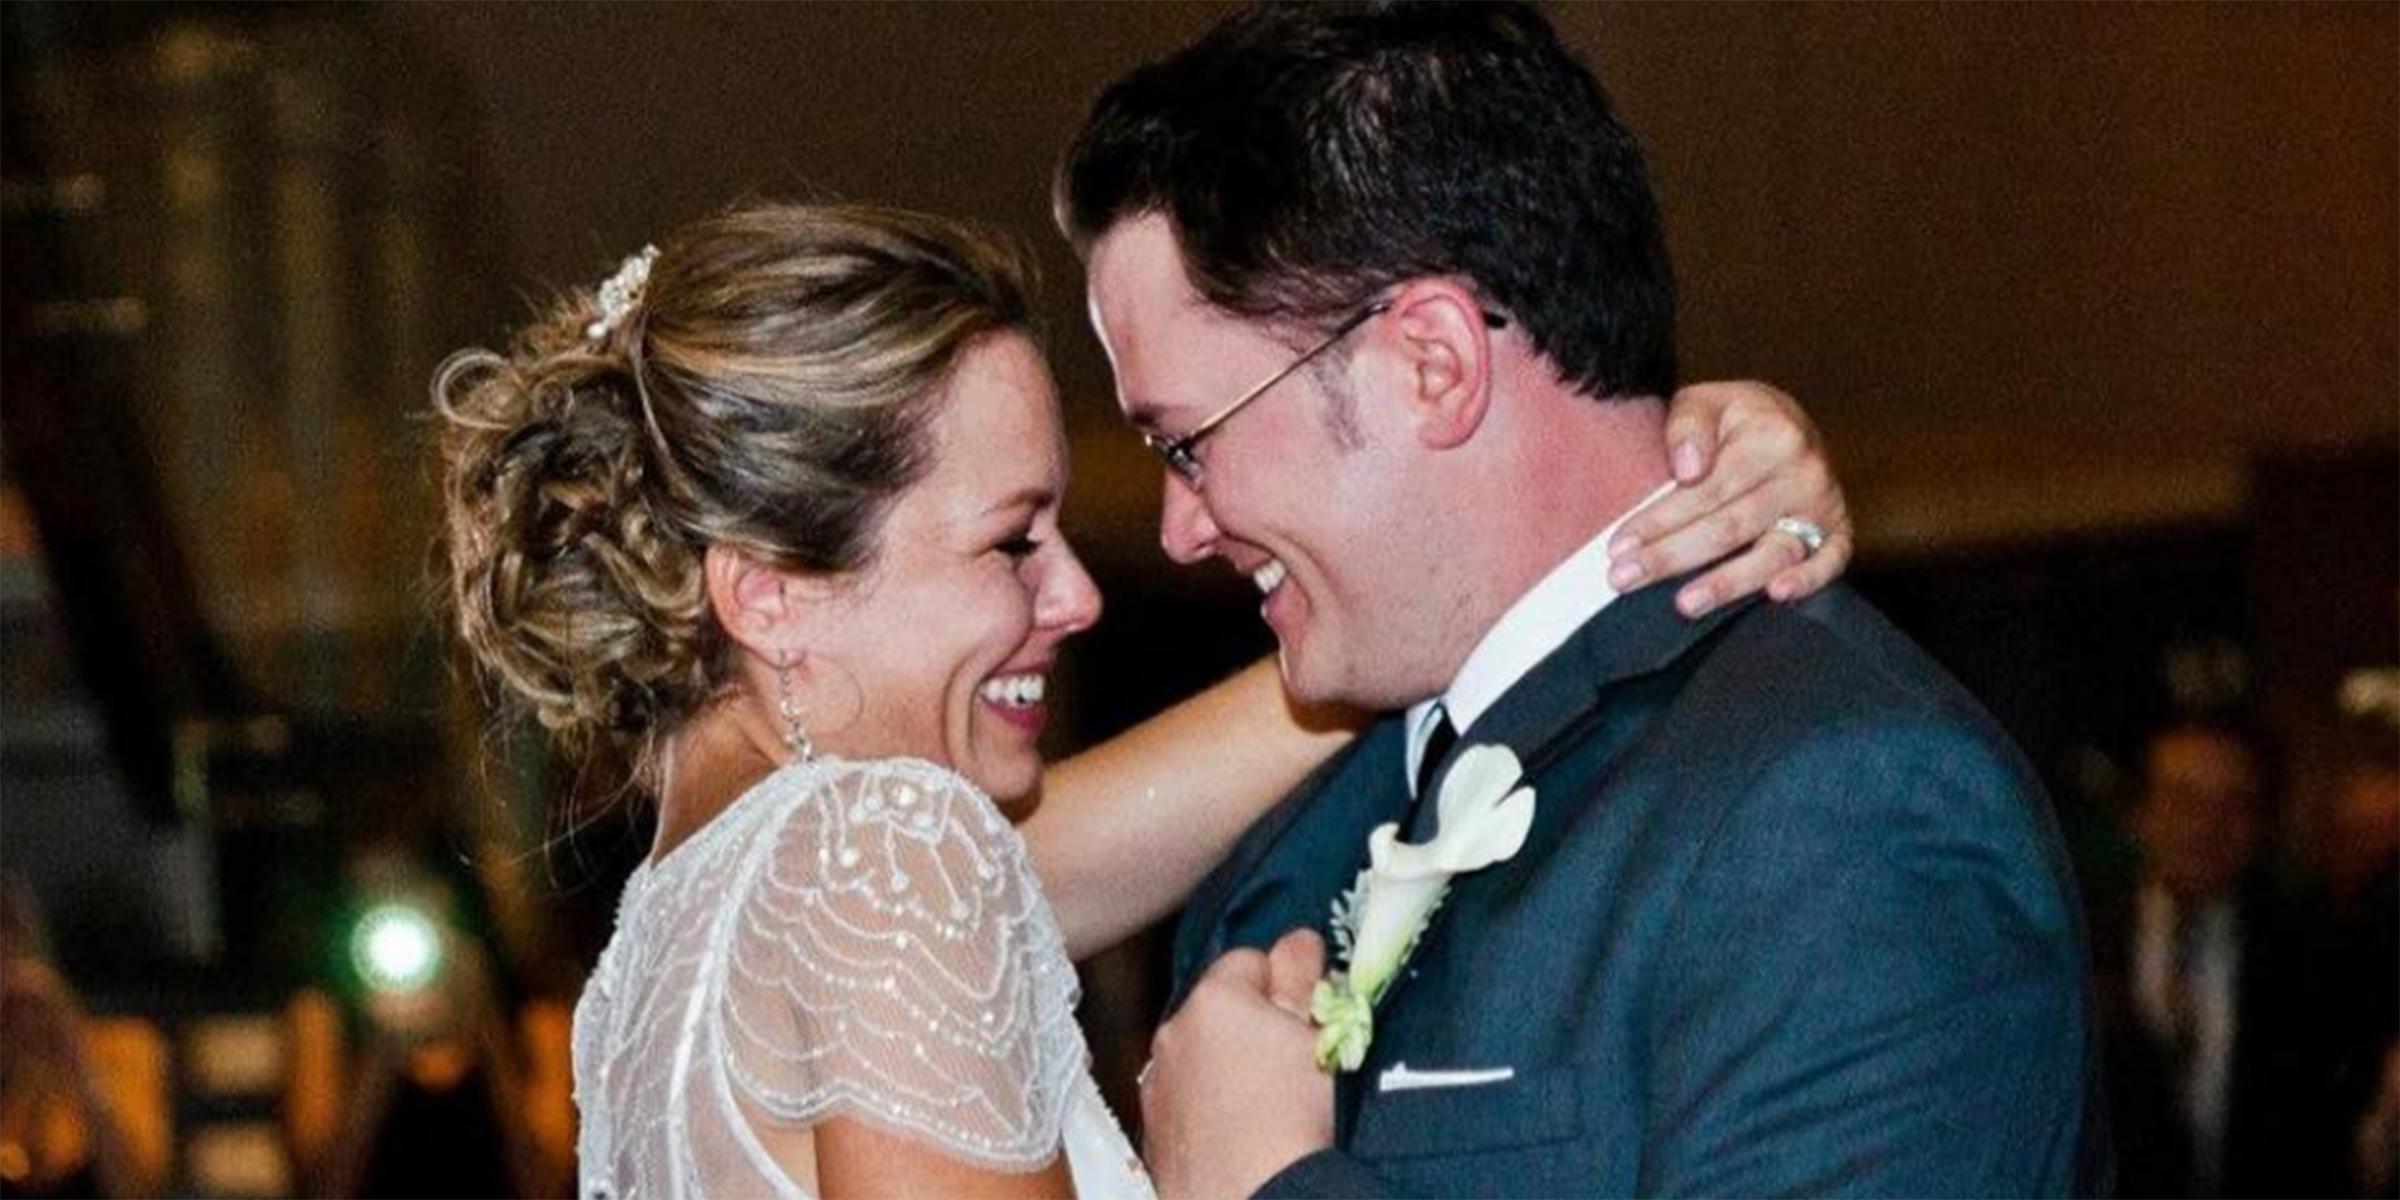 Dylan Dreyer Wedding Photos